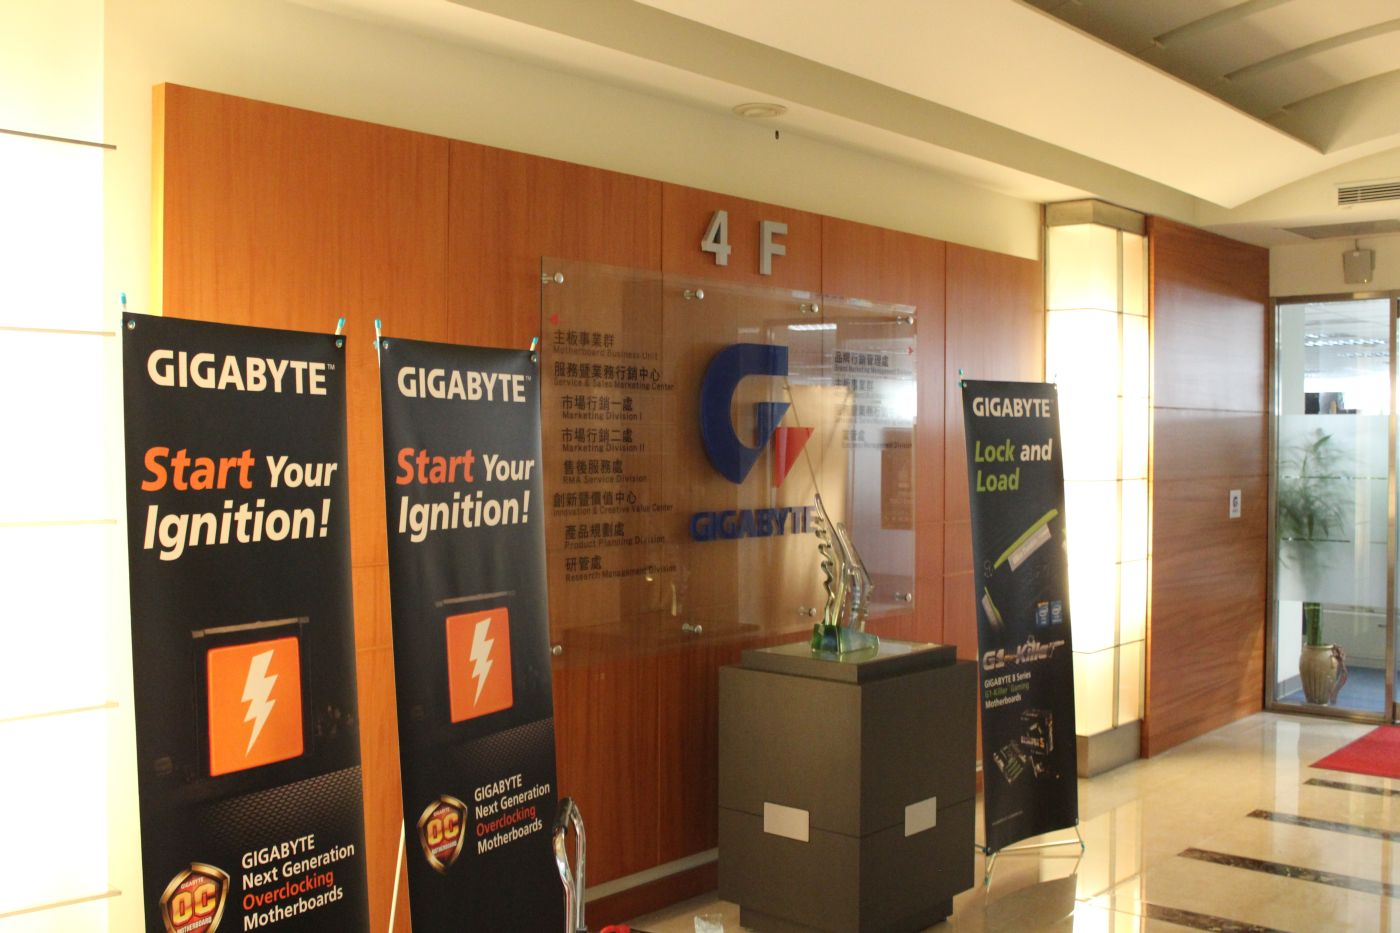 Benchen im GIGABYTE OC-Lab (Computex Taiwan 2013)-img_1771.jpg